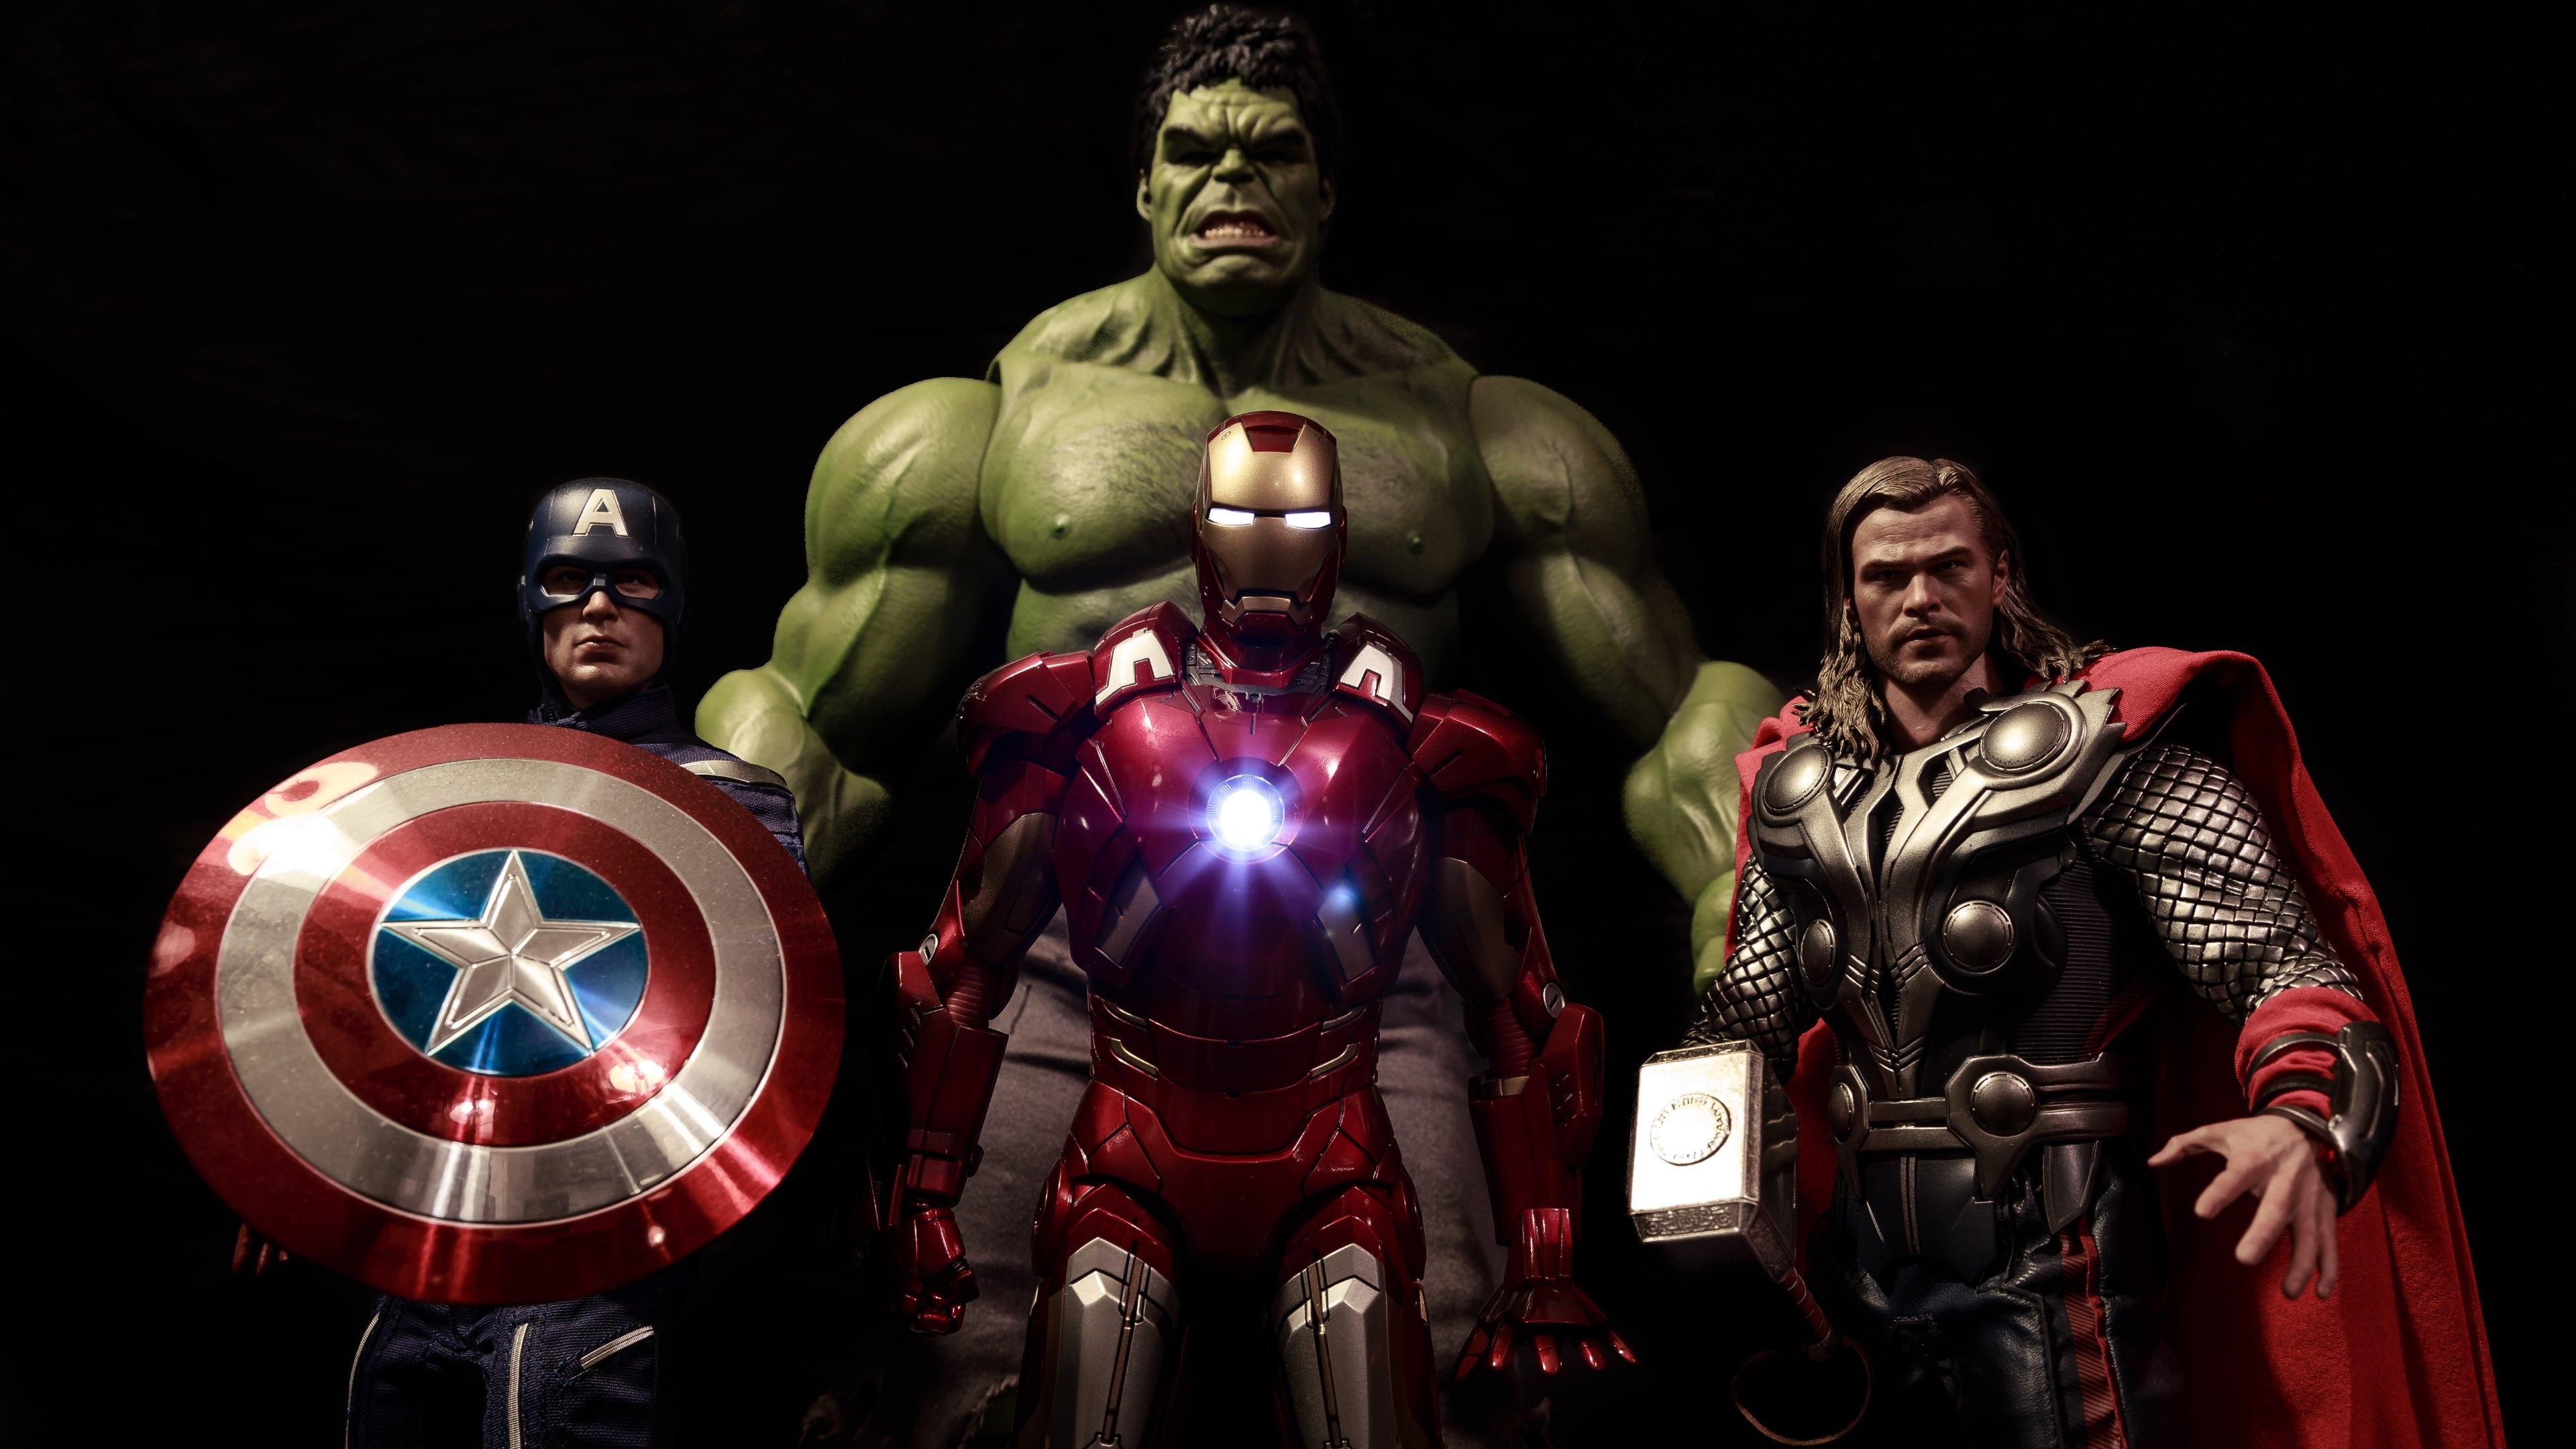 Iron man wolverine captain america amp hulk hd